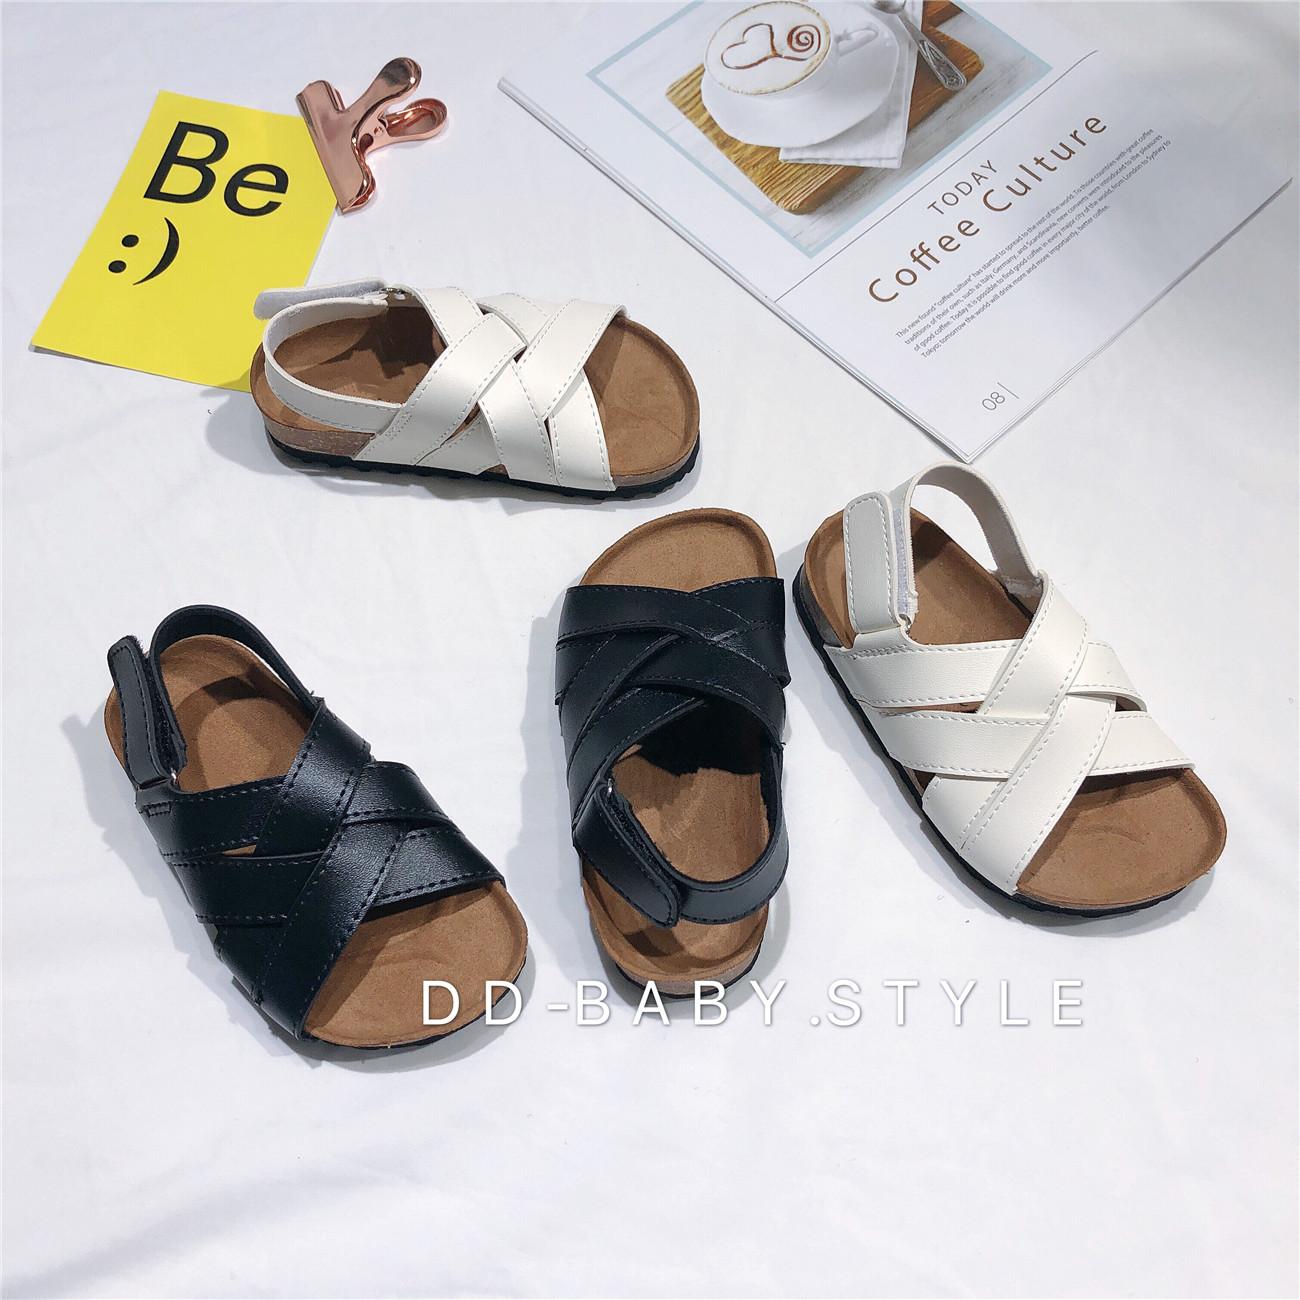 【DD家童装】新品男童夏季凉鞋 魔术贴性价比宝宝童鞋